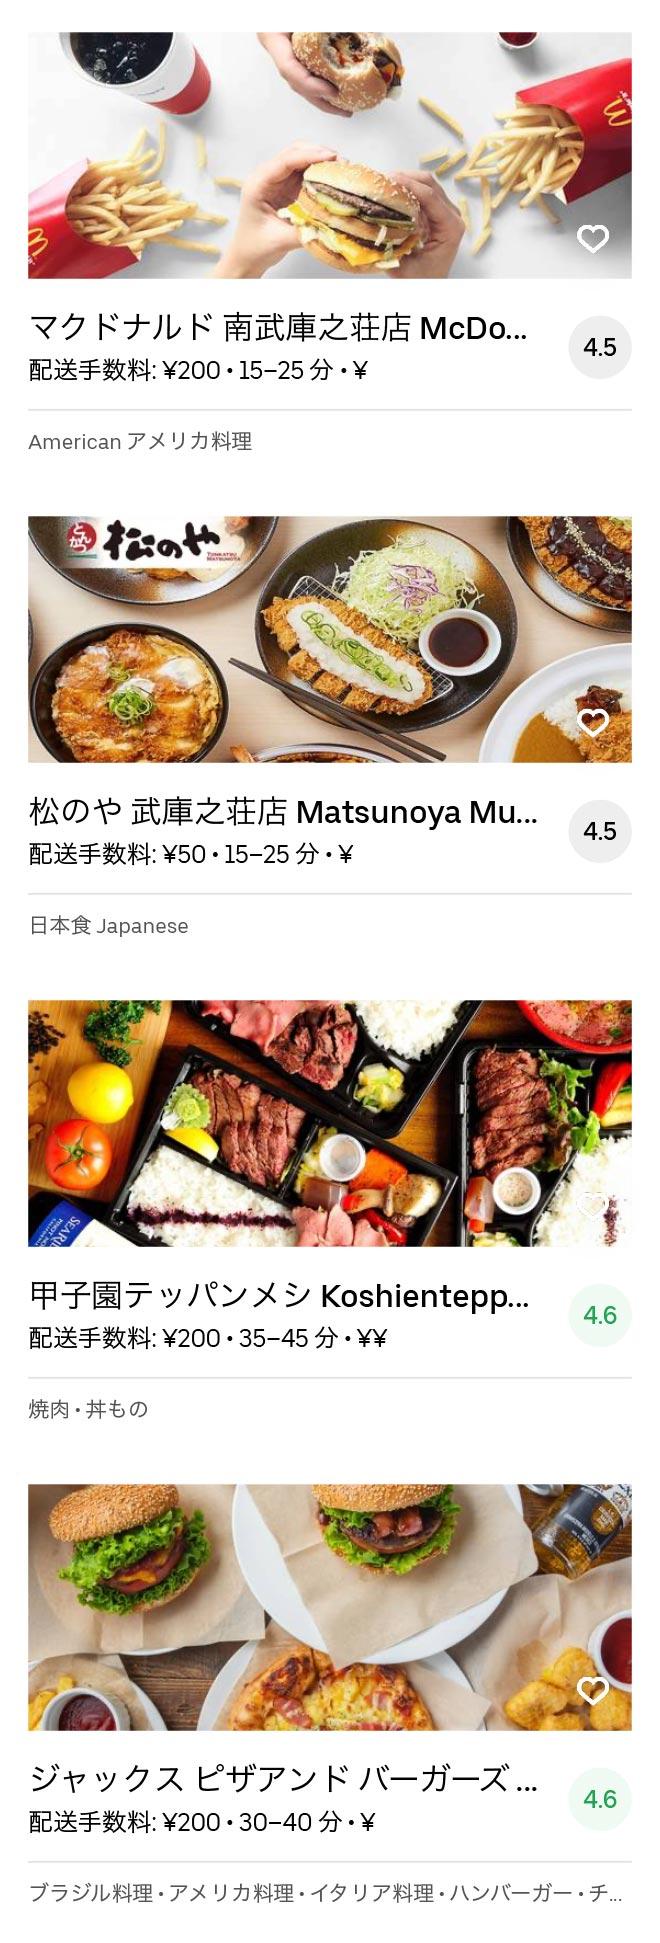 Amagasaki mukonosou menu 2005 03